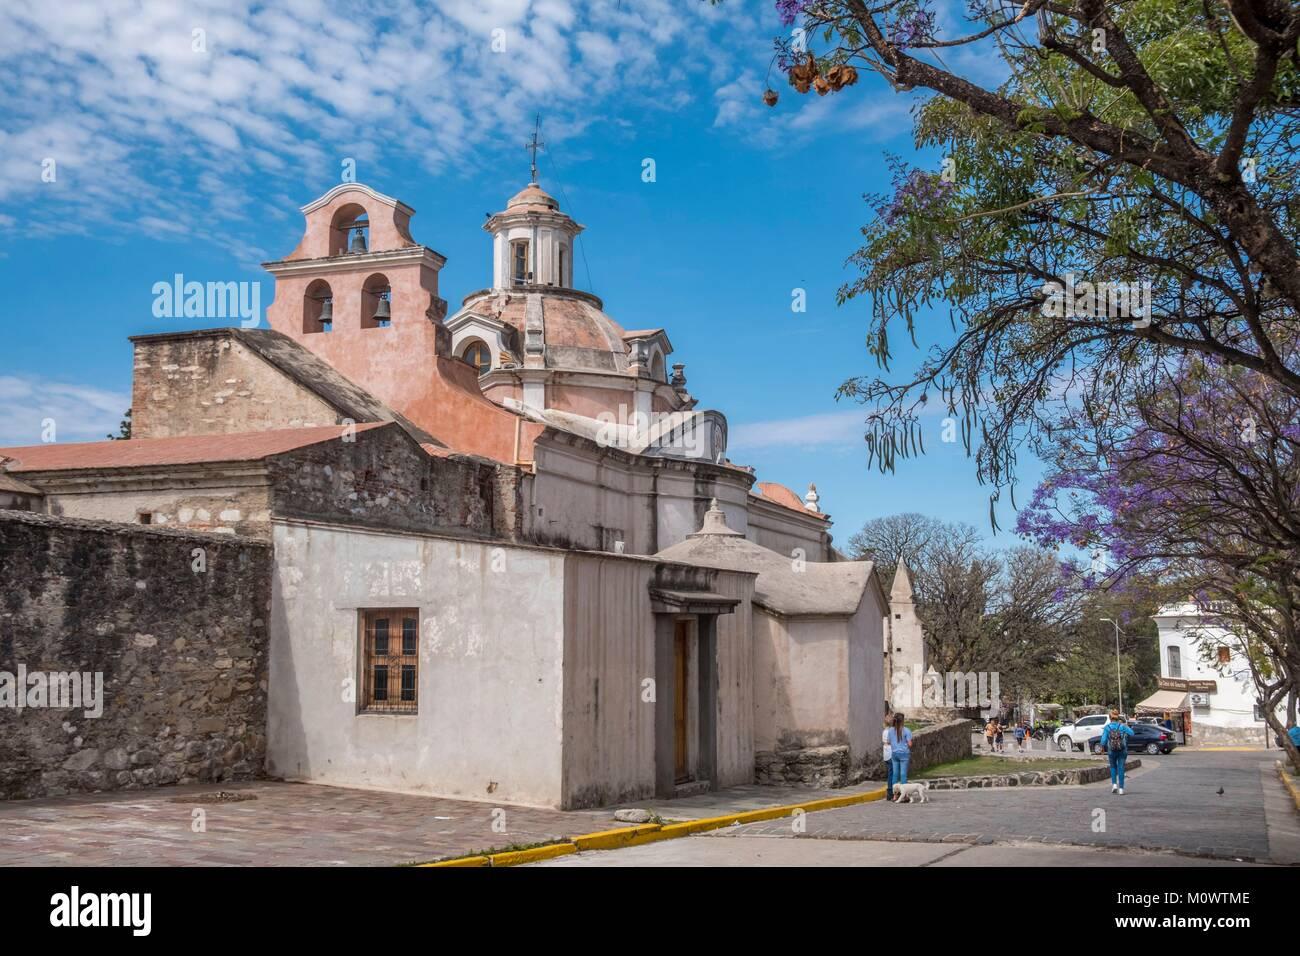 Argentina,Cordoba province,Alta Gracia,Nuestra Senora de la Merced Church,part of the Jesuit Estancia - Stock Image